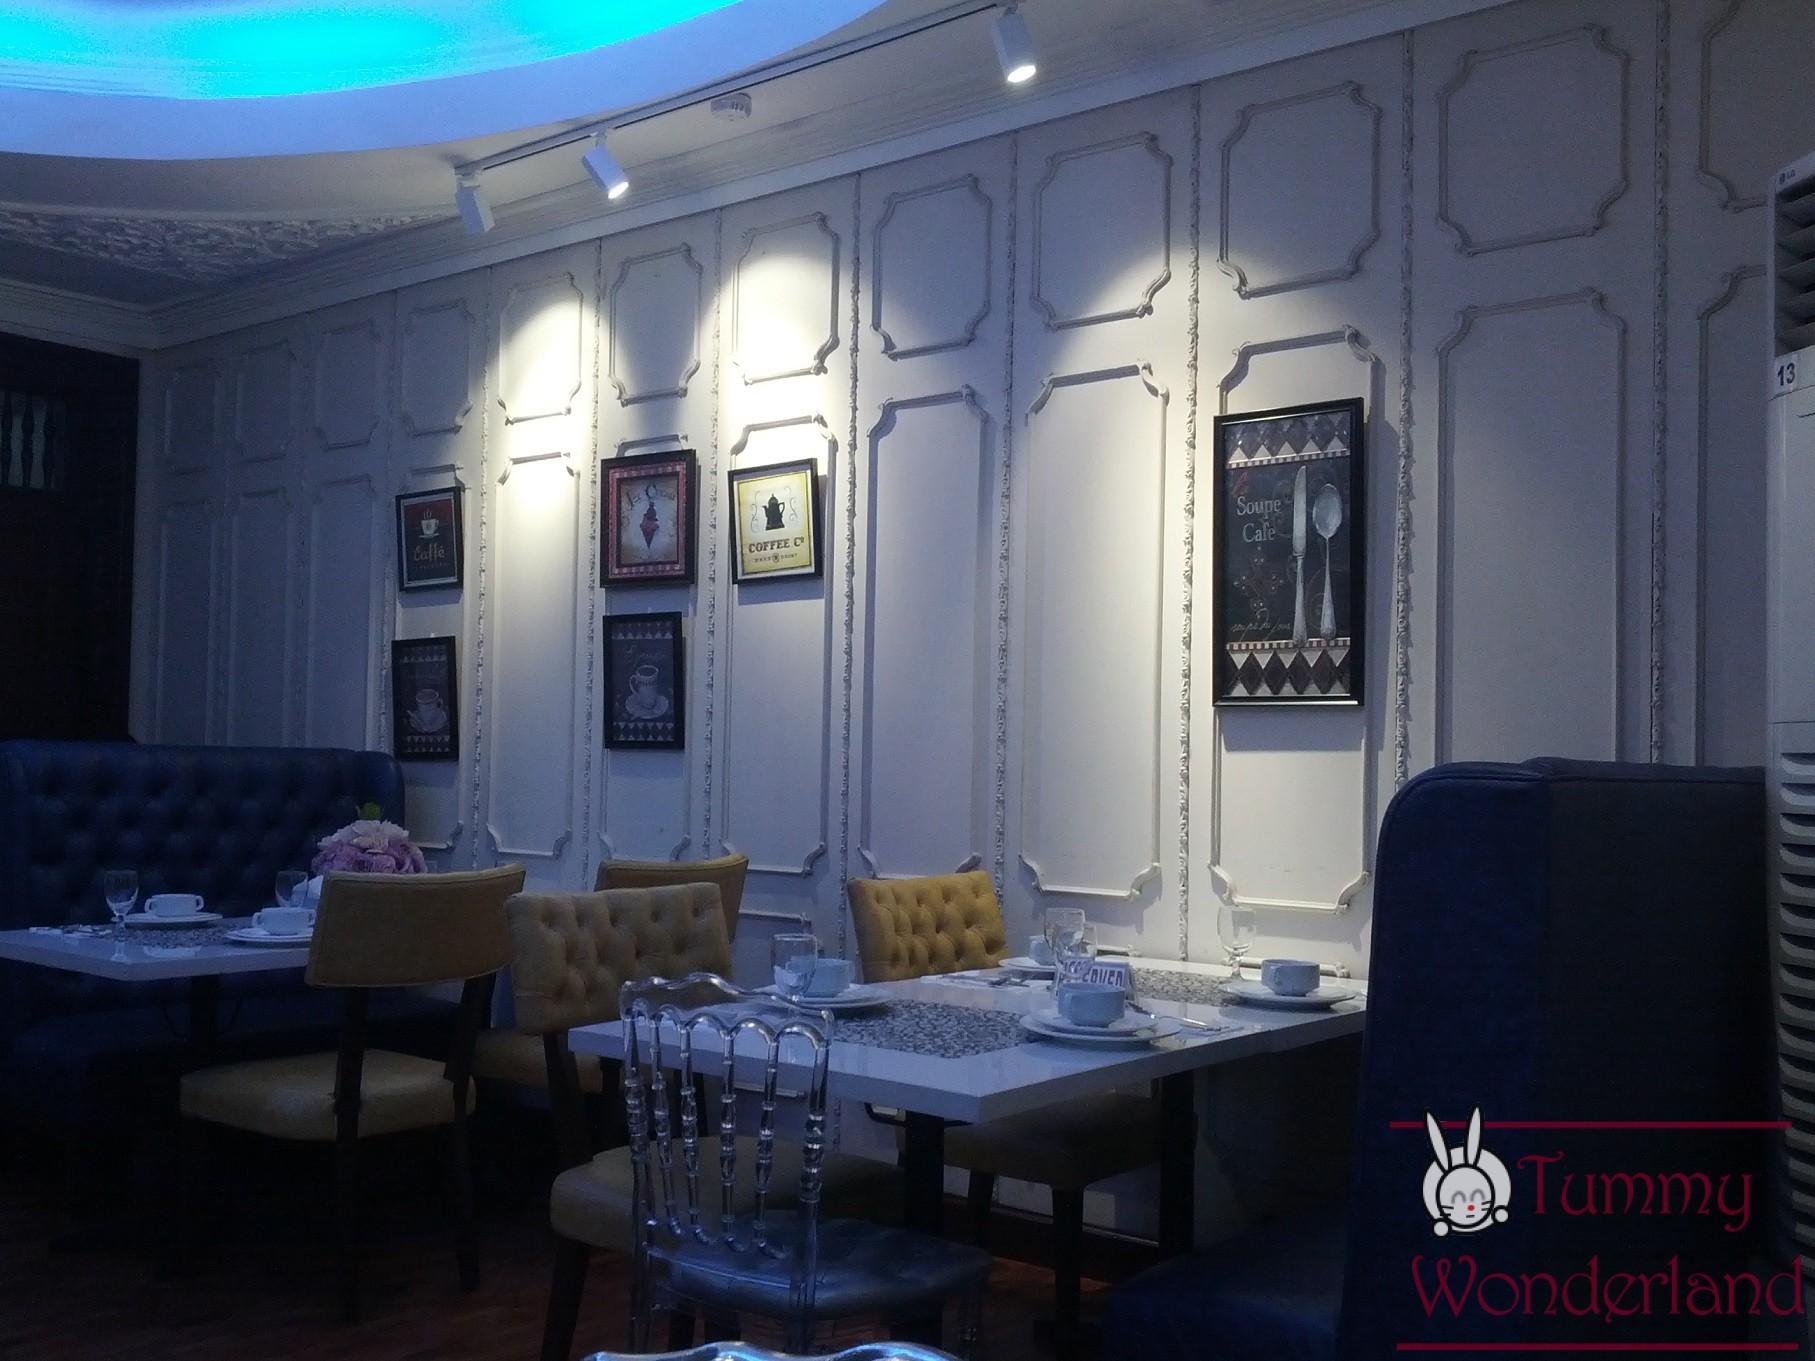 resto_cafe taverna